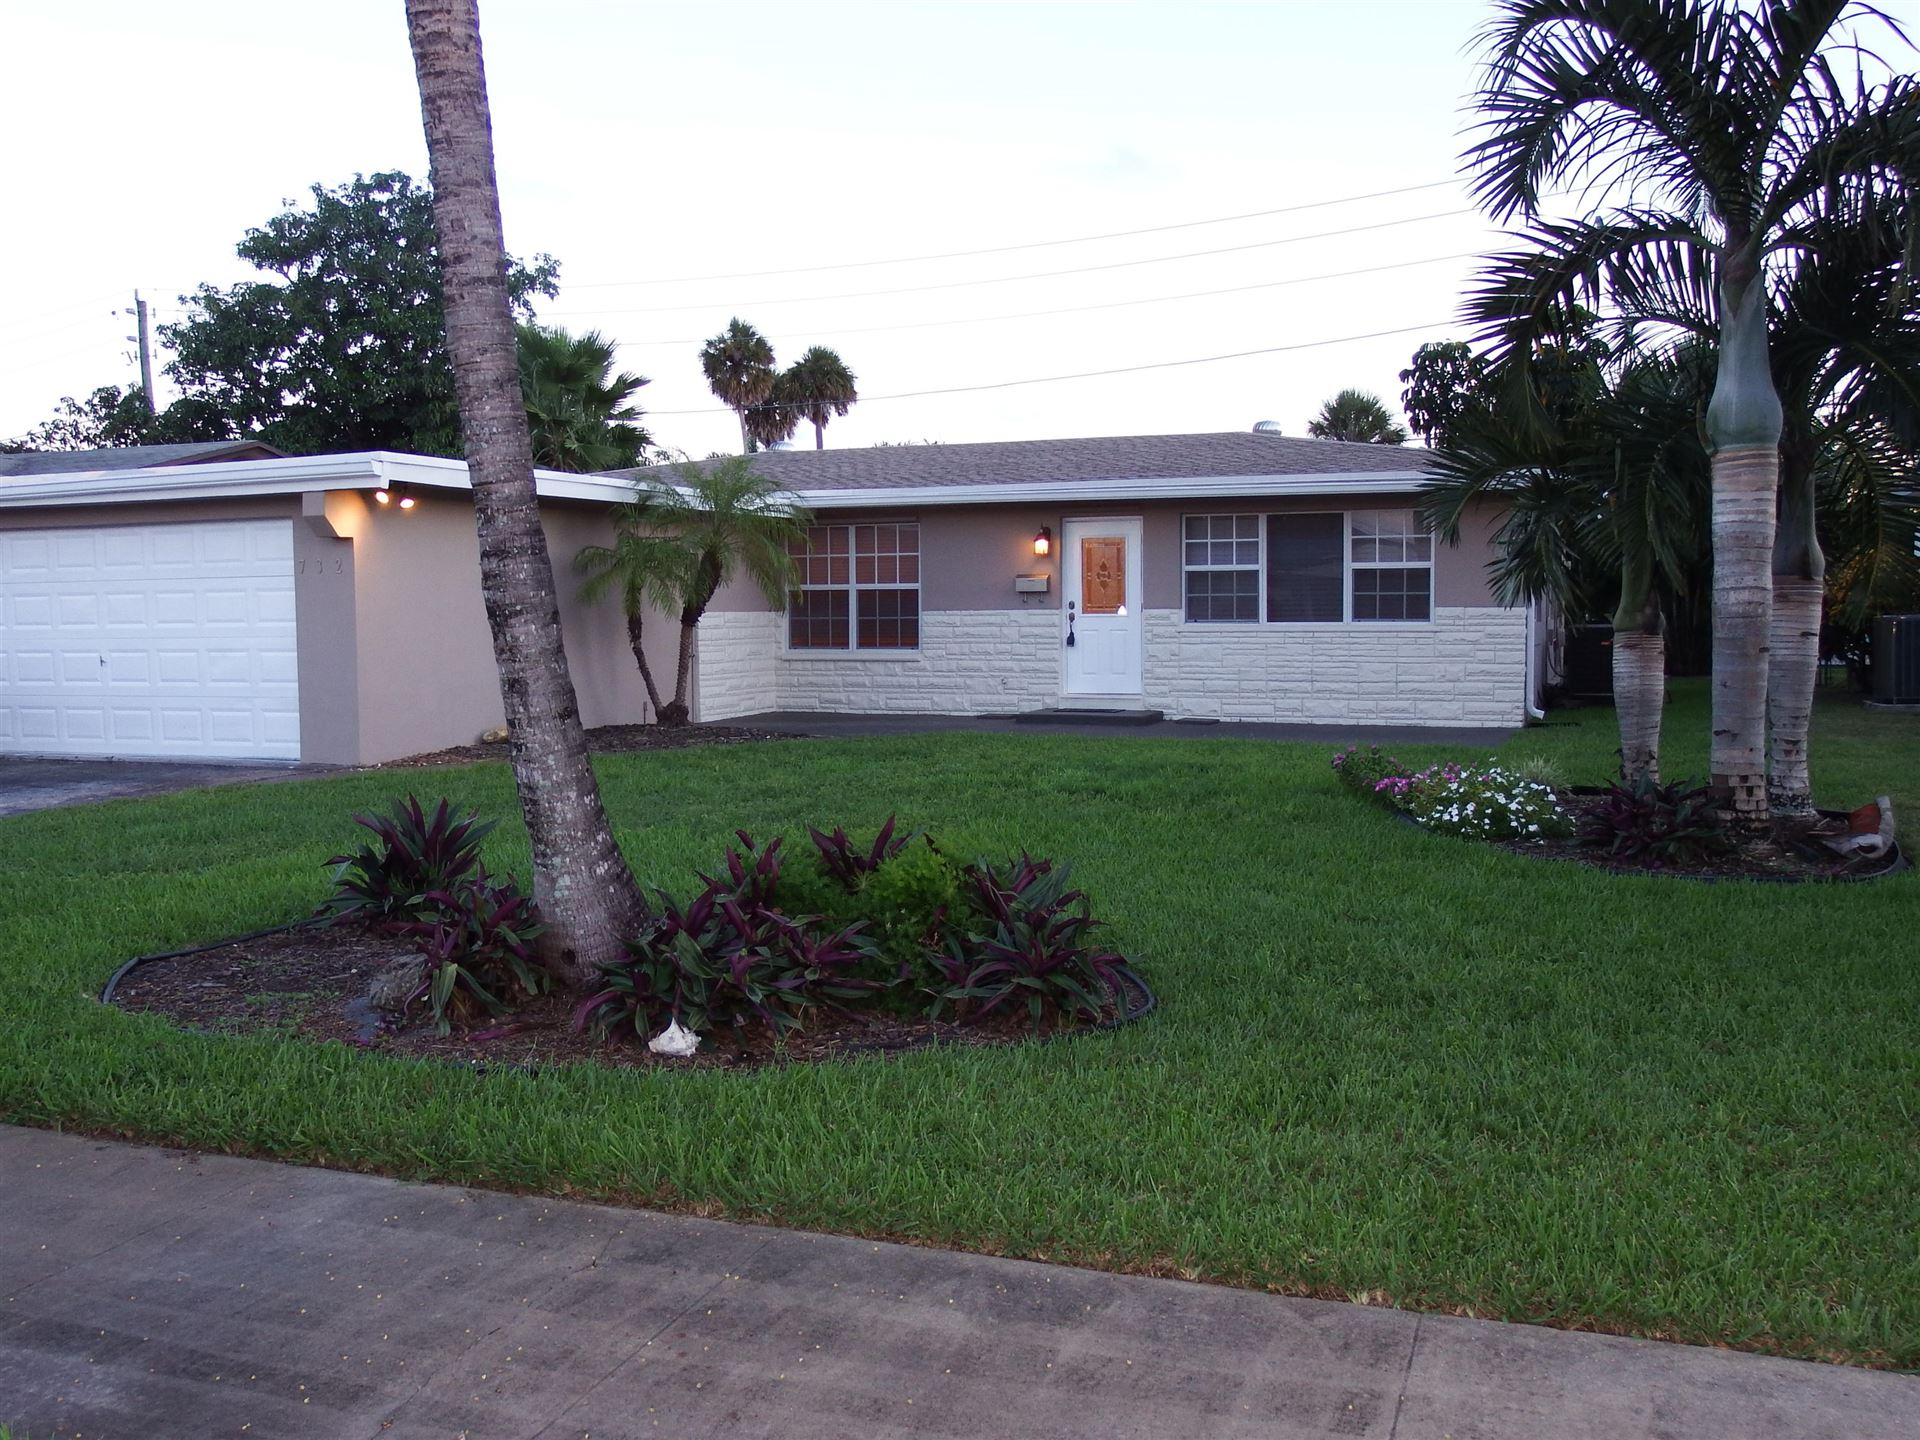 732 NW 28 Street, Wilton Manors, FL 33311 - #: RX-10724692